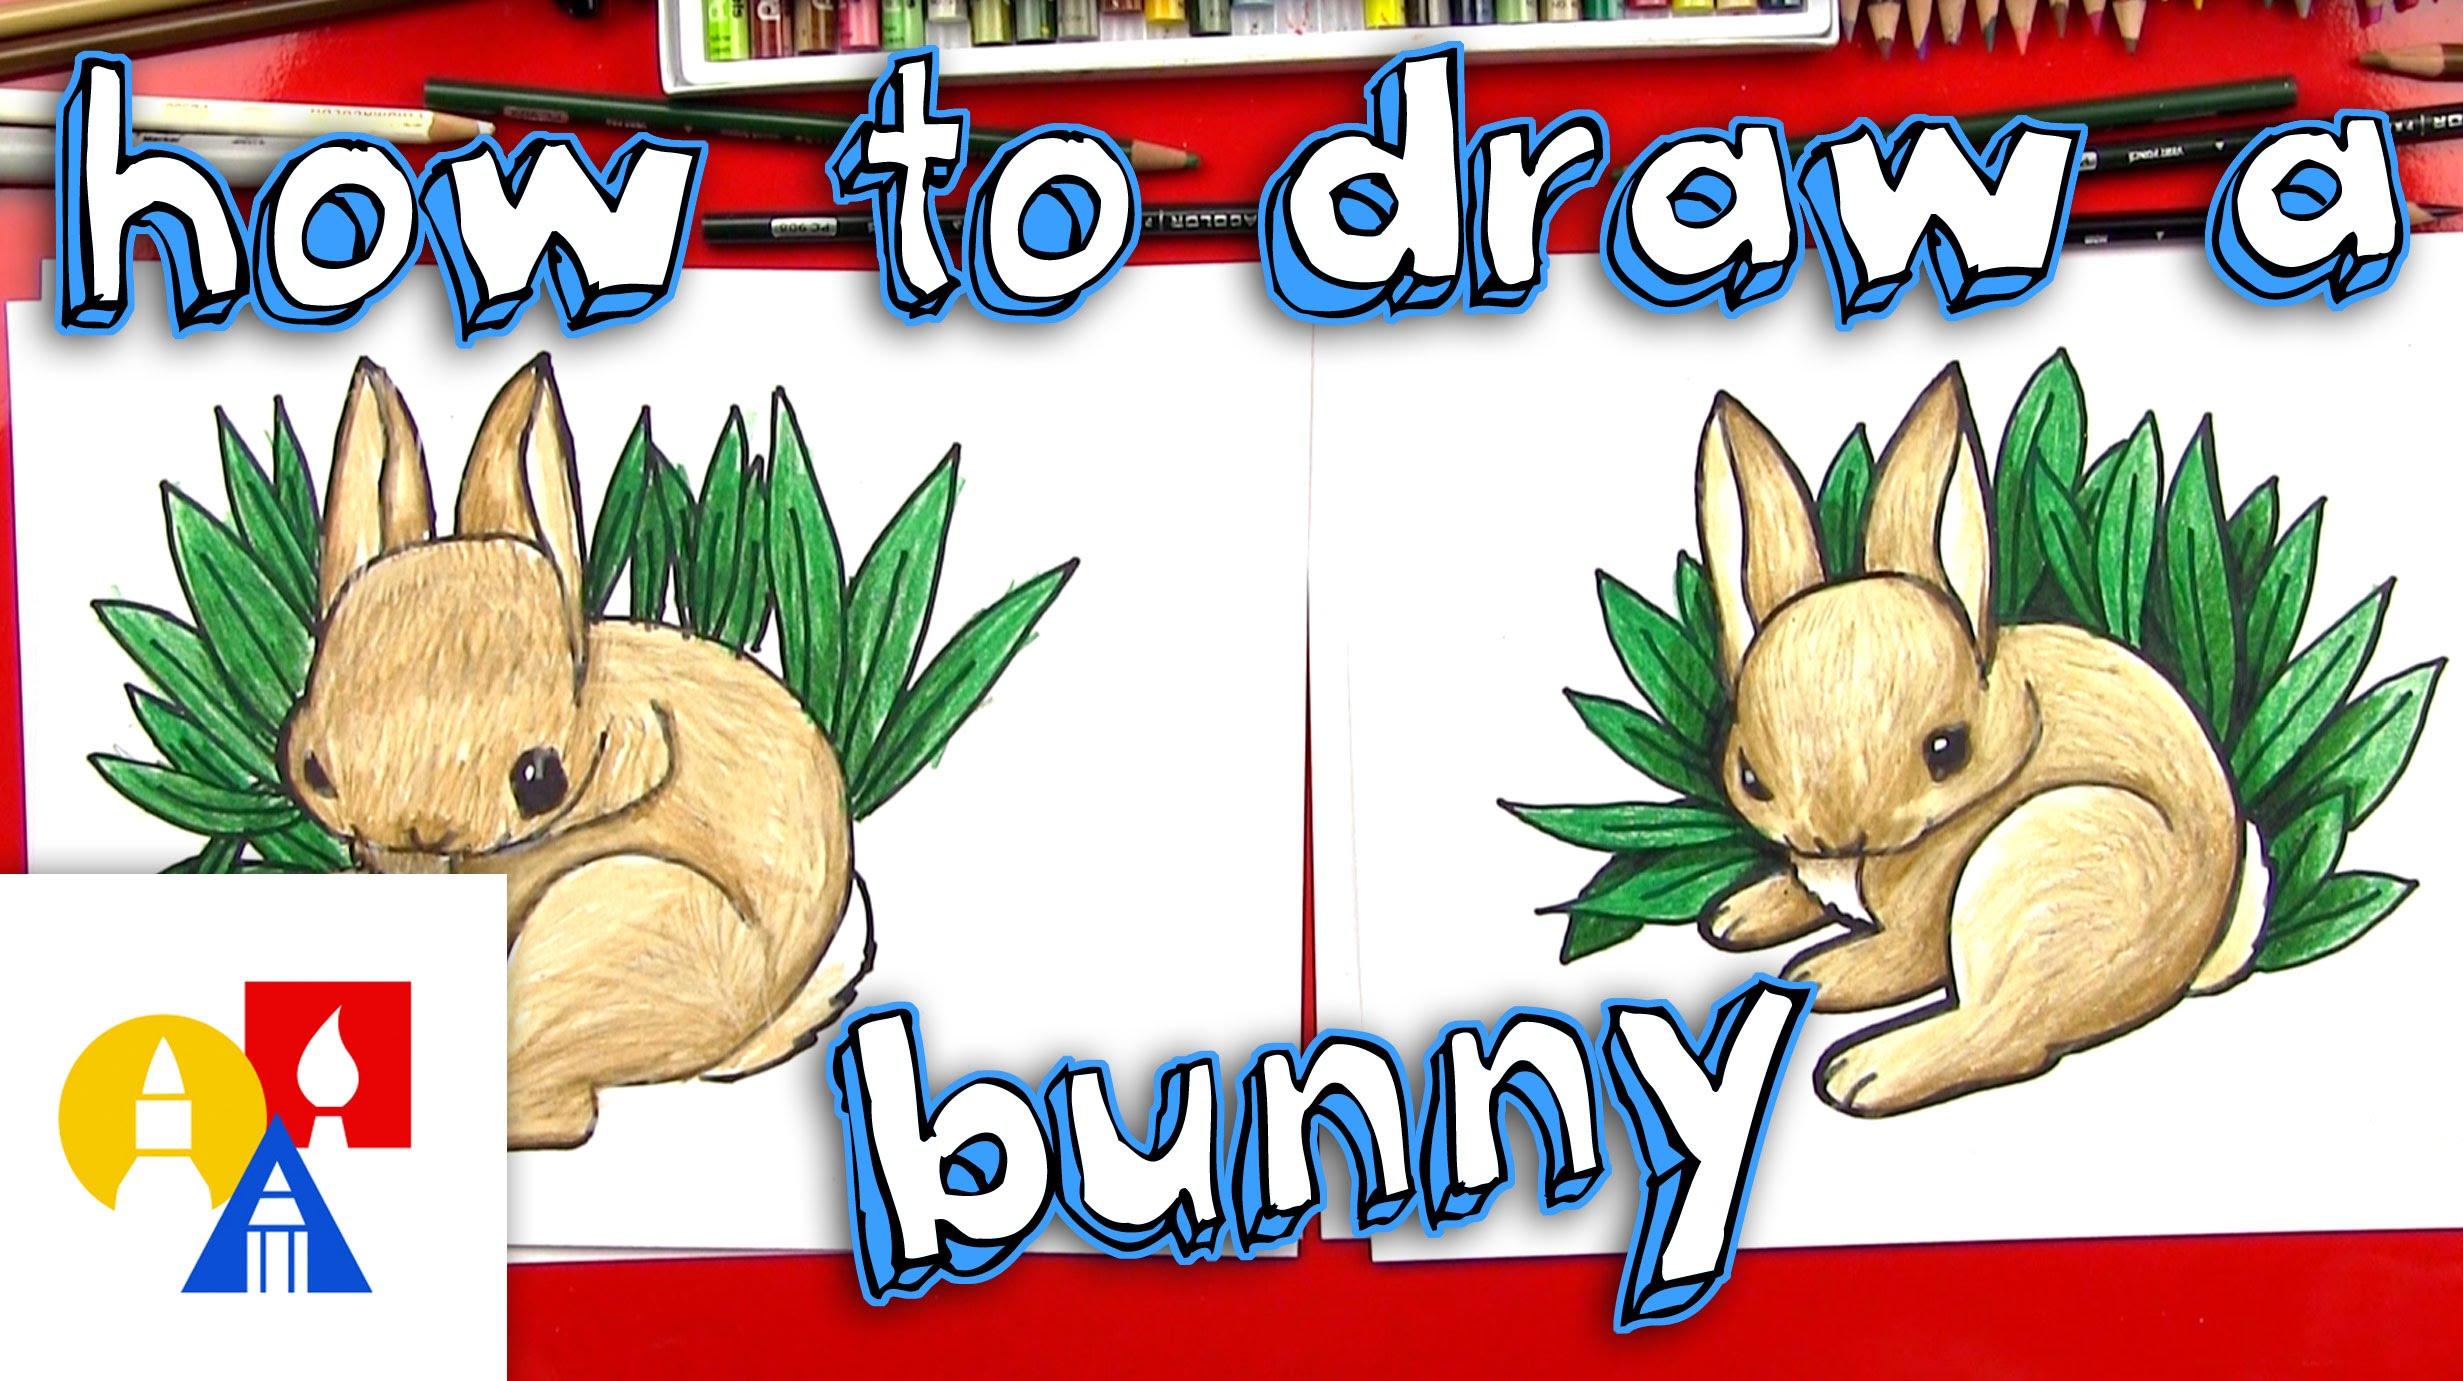 Drawn rabbit art for kid hub Draw A Bunny How